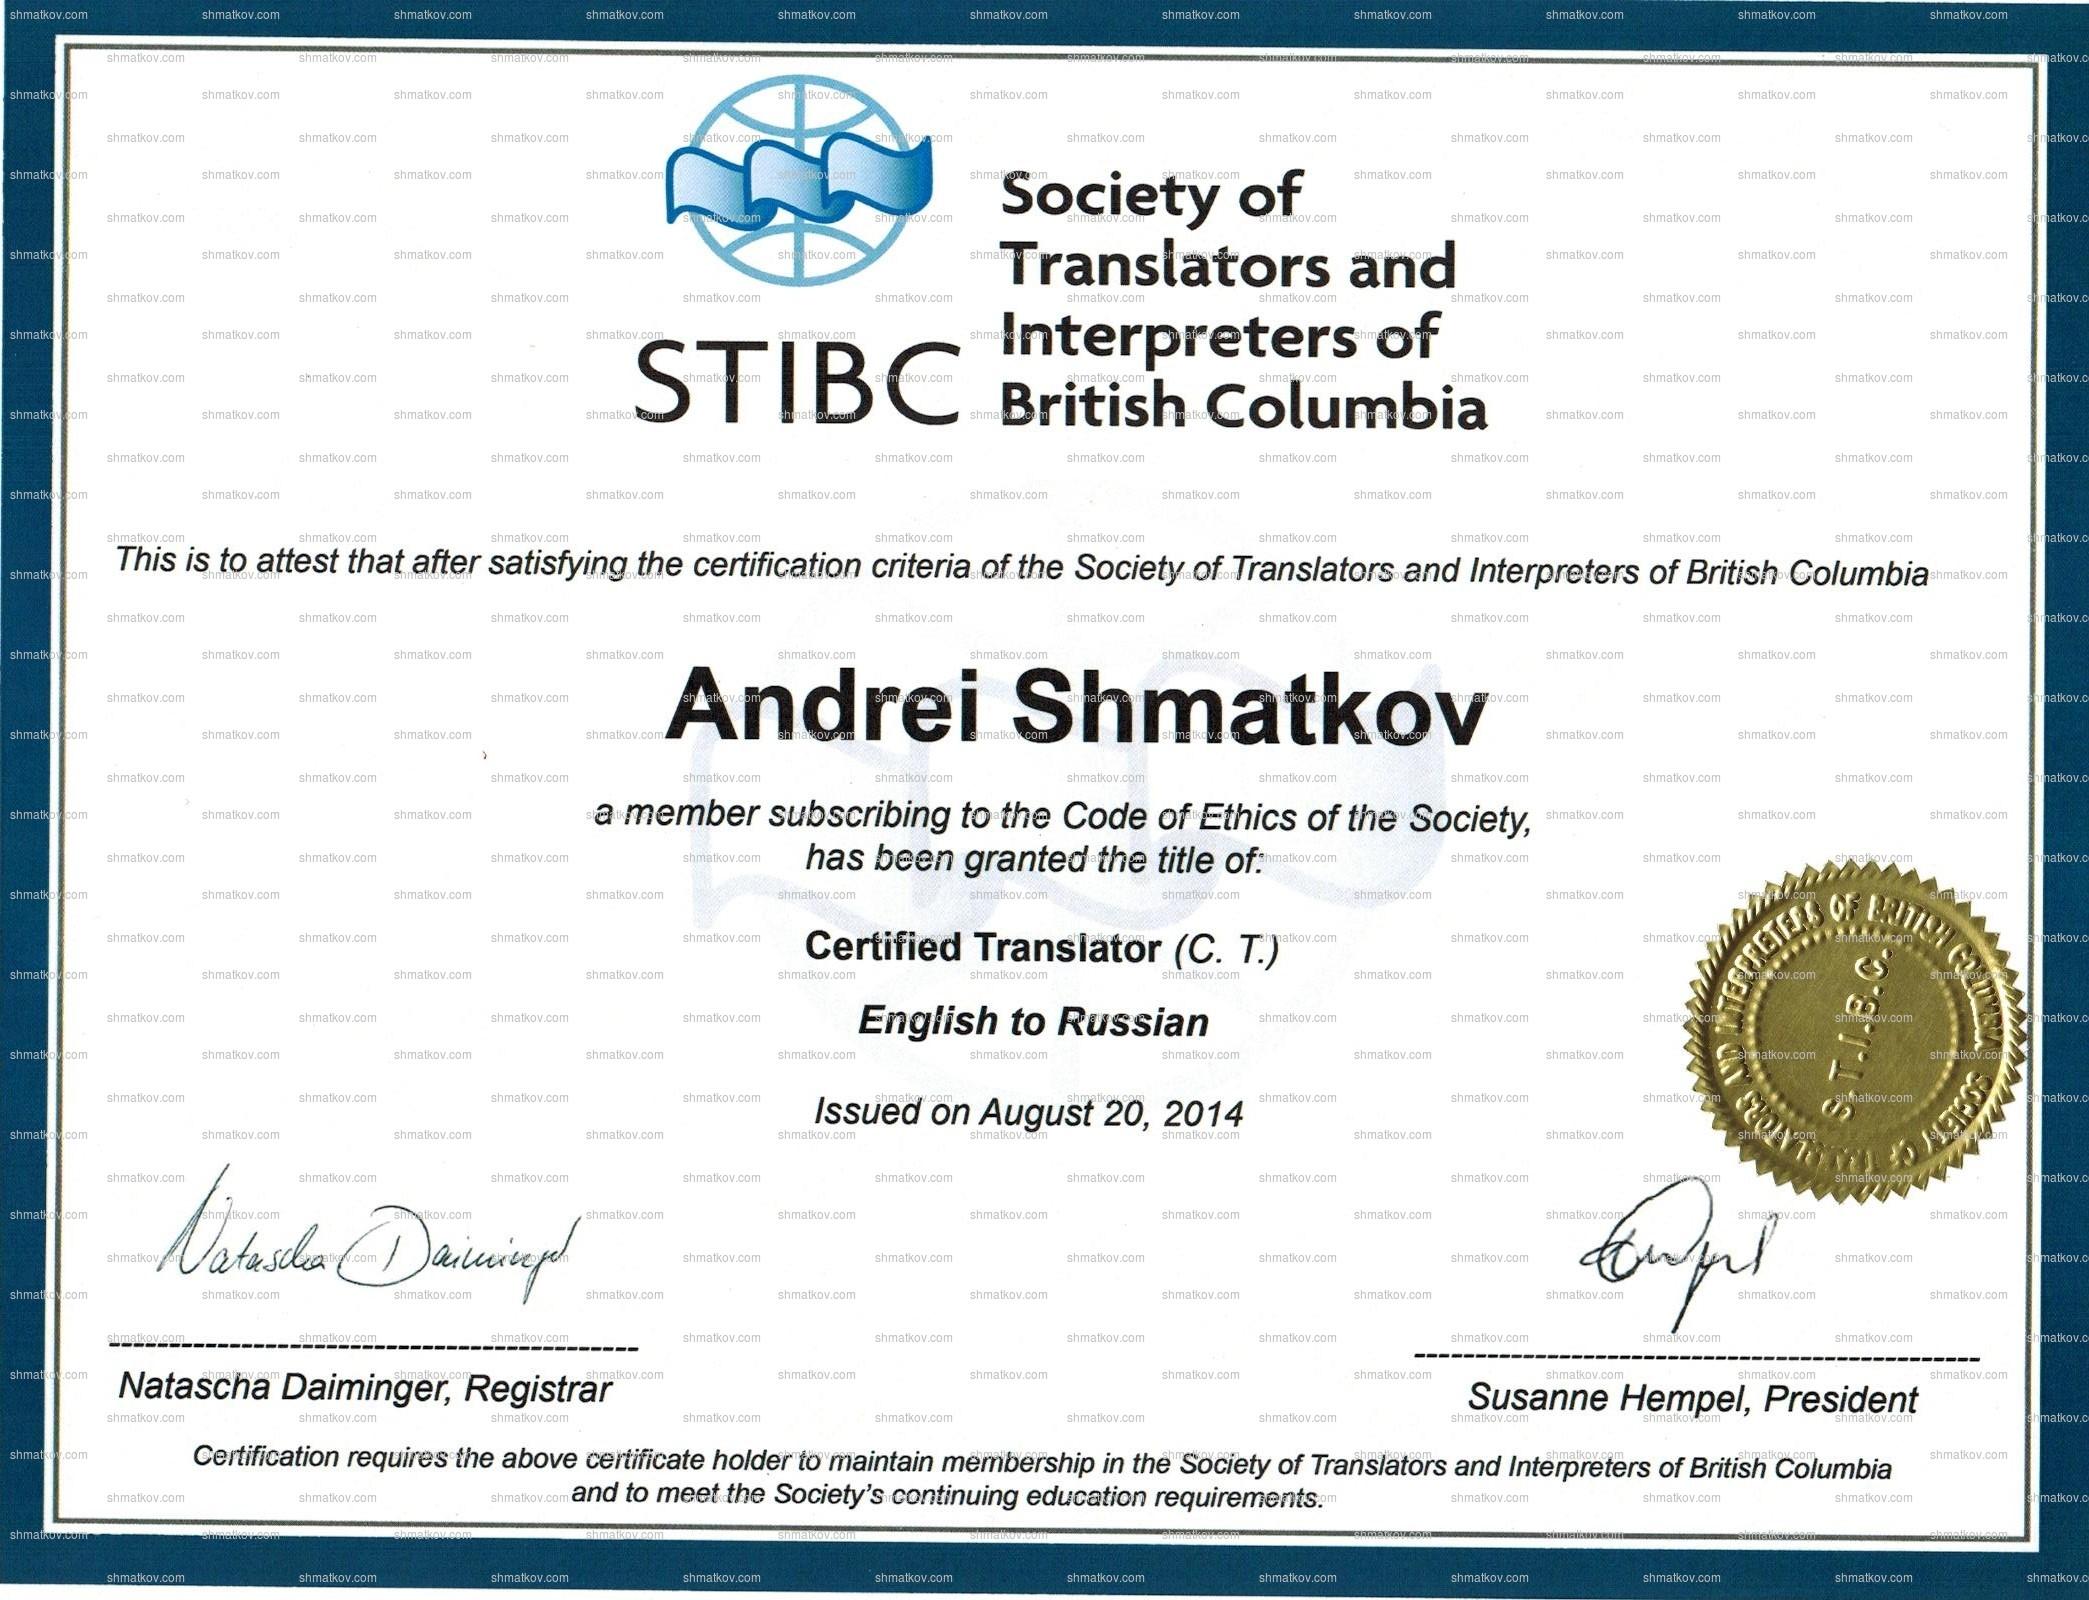 english russian certificate translator certified translation genuine canada document meet british andrei pussy exam teen sleight hand korean into translators